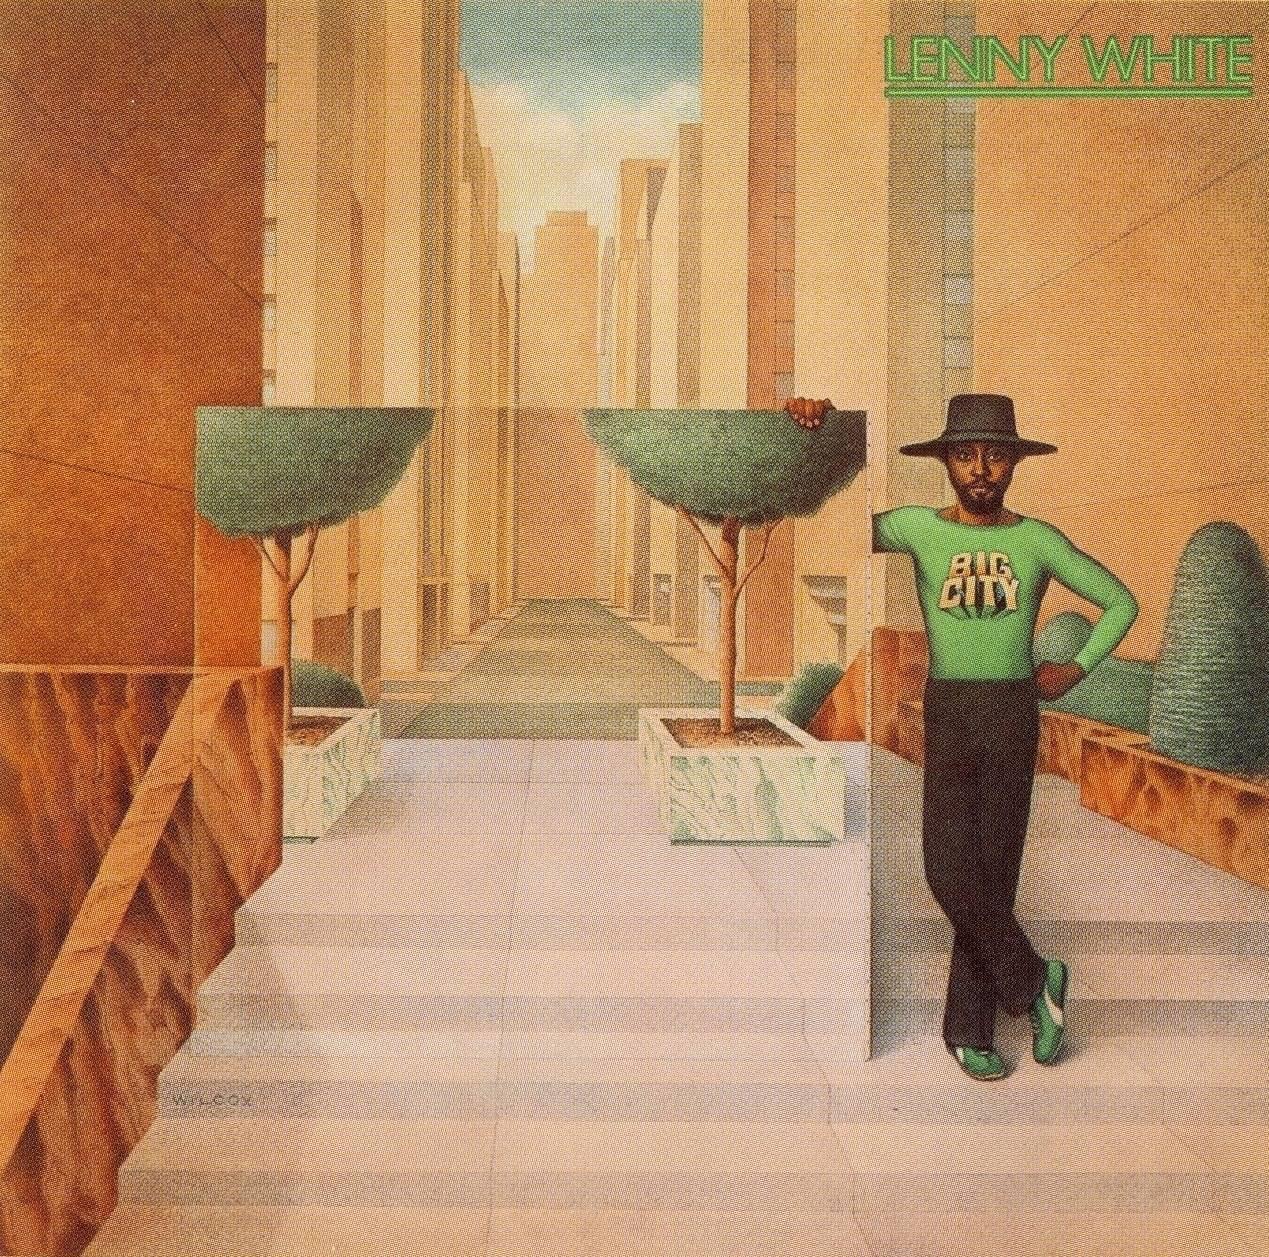 Lenny White - Big City (1977) [2017, Remastered Reissue]